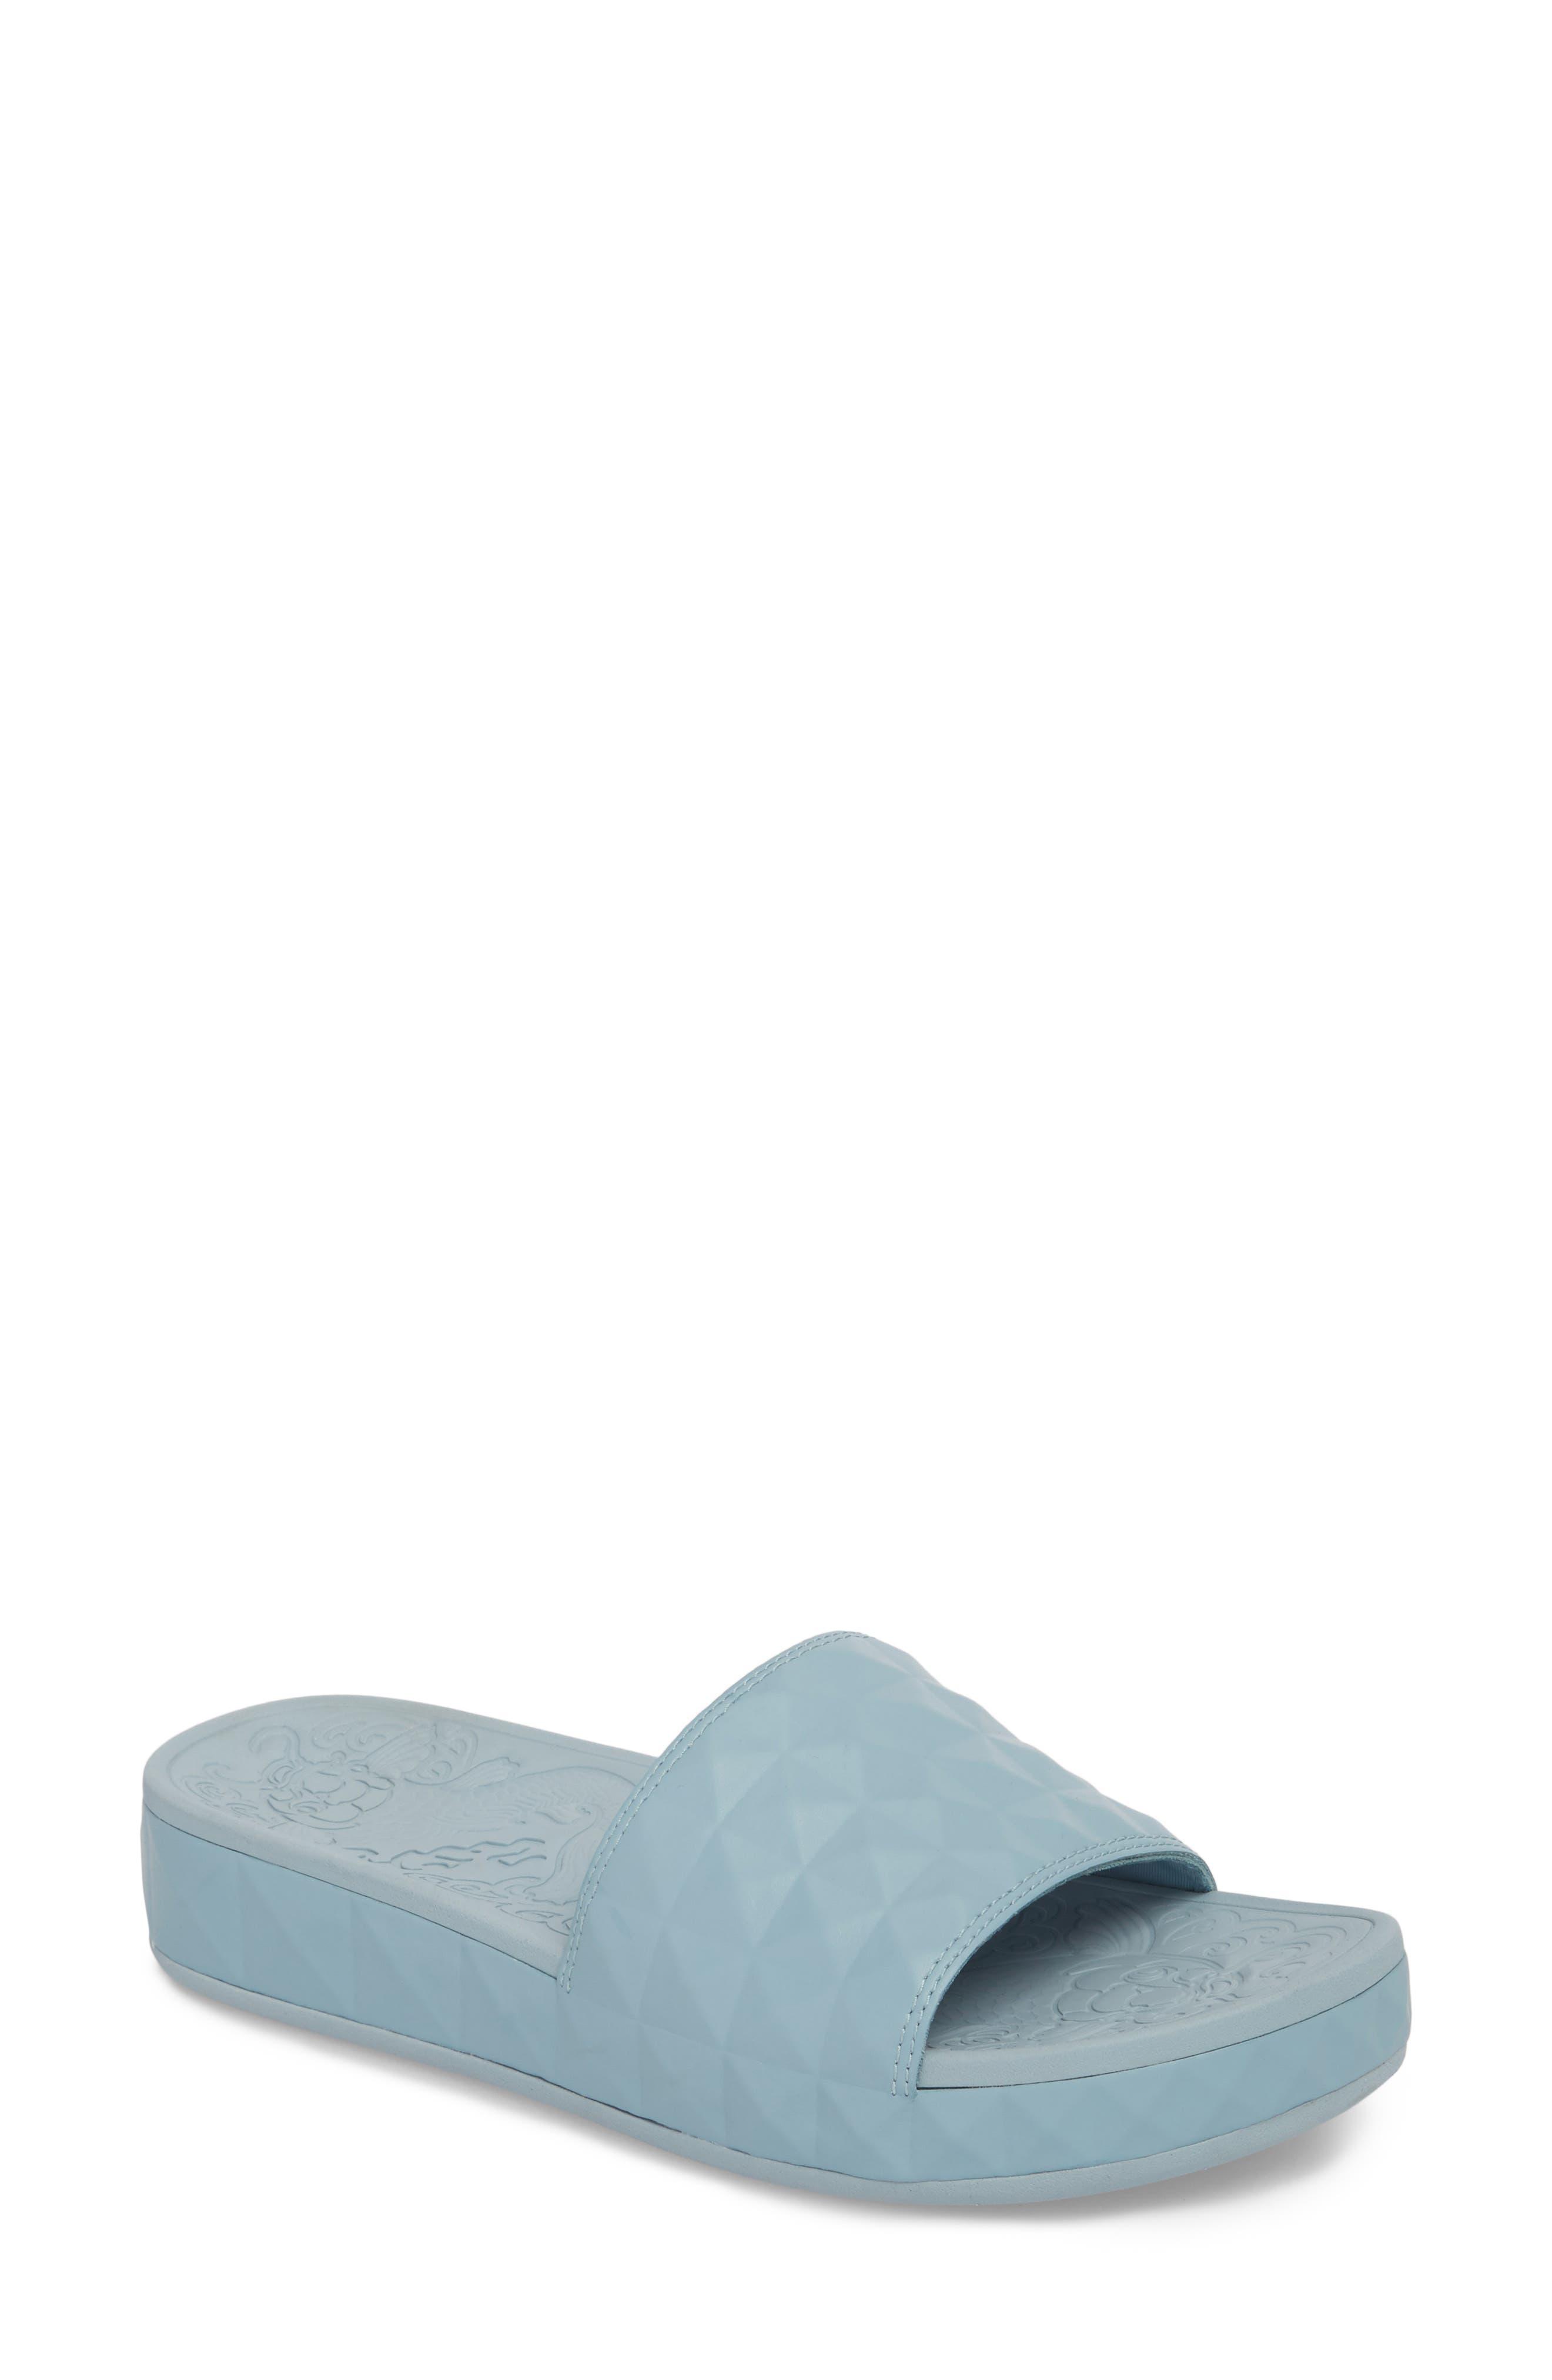 Splash Geo Slide Sandal,                         Main,                         color, Ice Blue